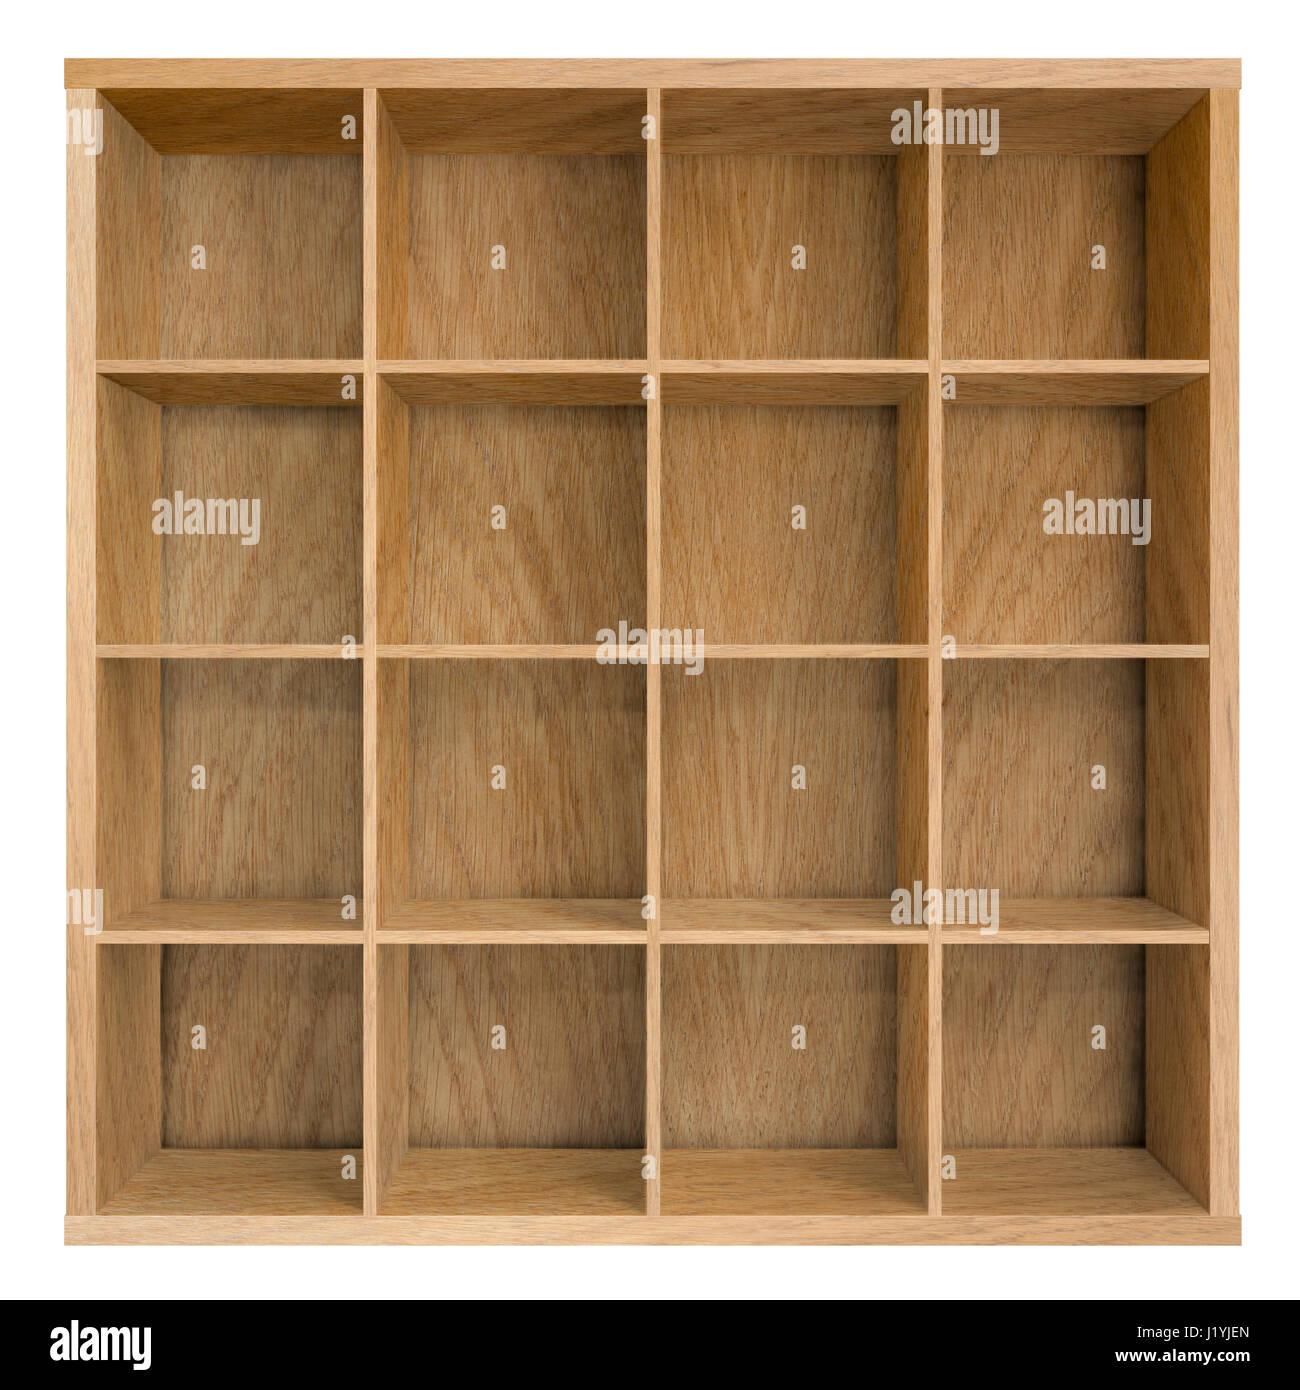 Empty square bookshelf or bookcase 3d illustration - Stock Image